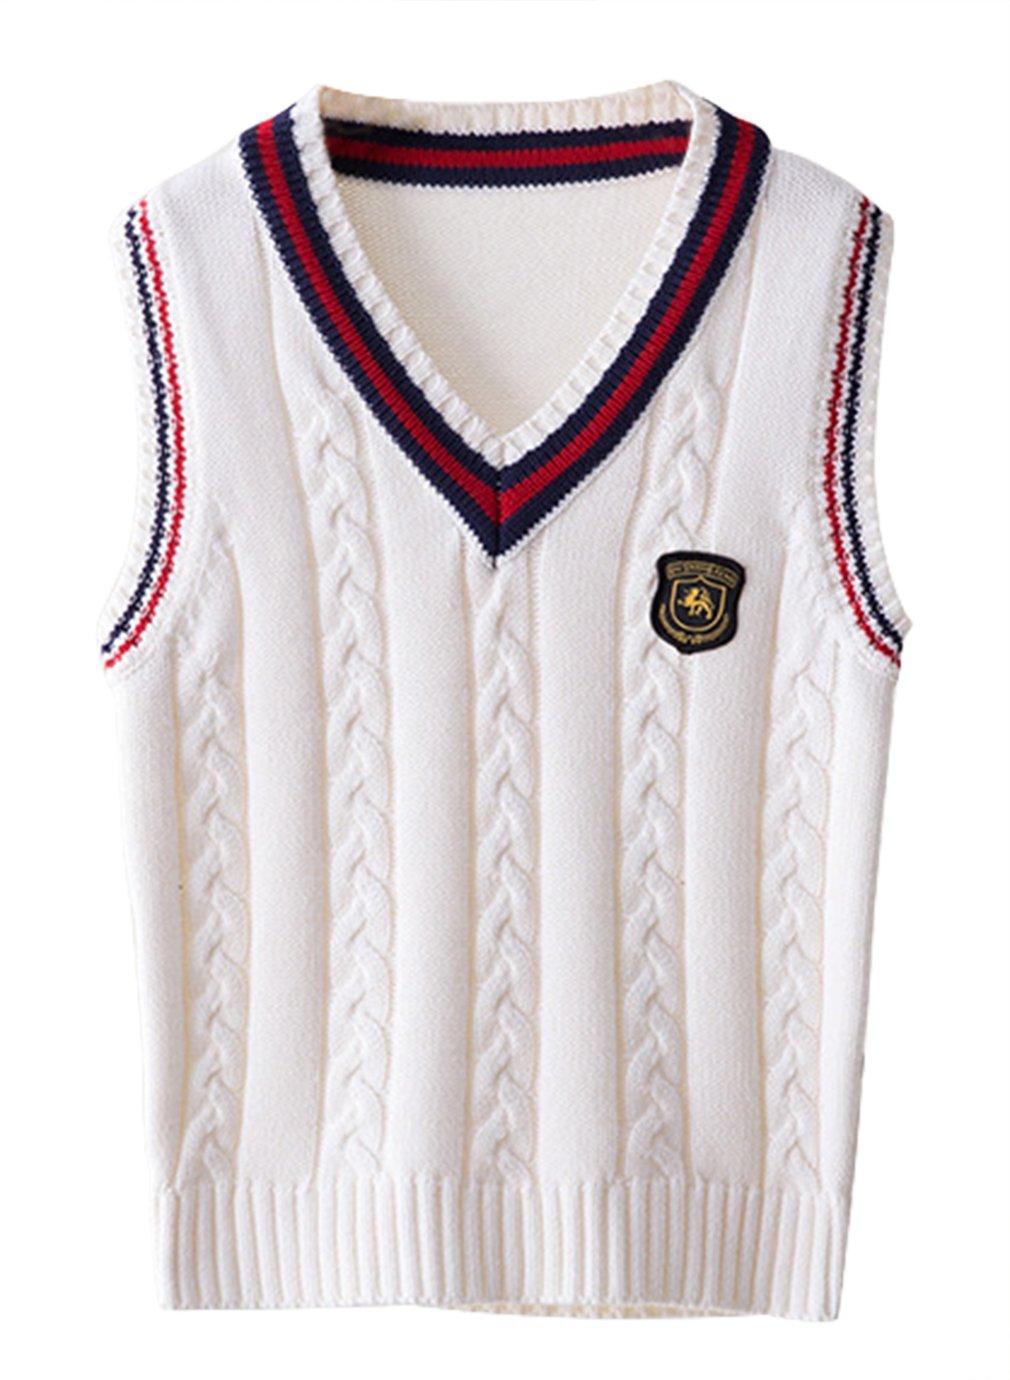 La Vogue Boy Vest V-Neck Knit Pullover School Uniform Sweater Cotton Waistcoat Beige 4-5Y